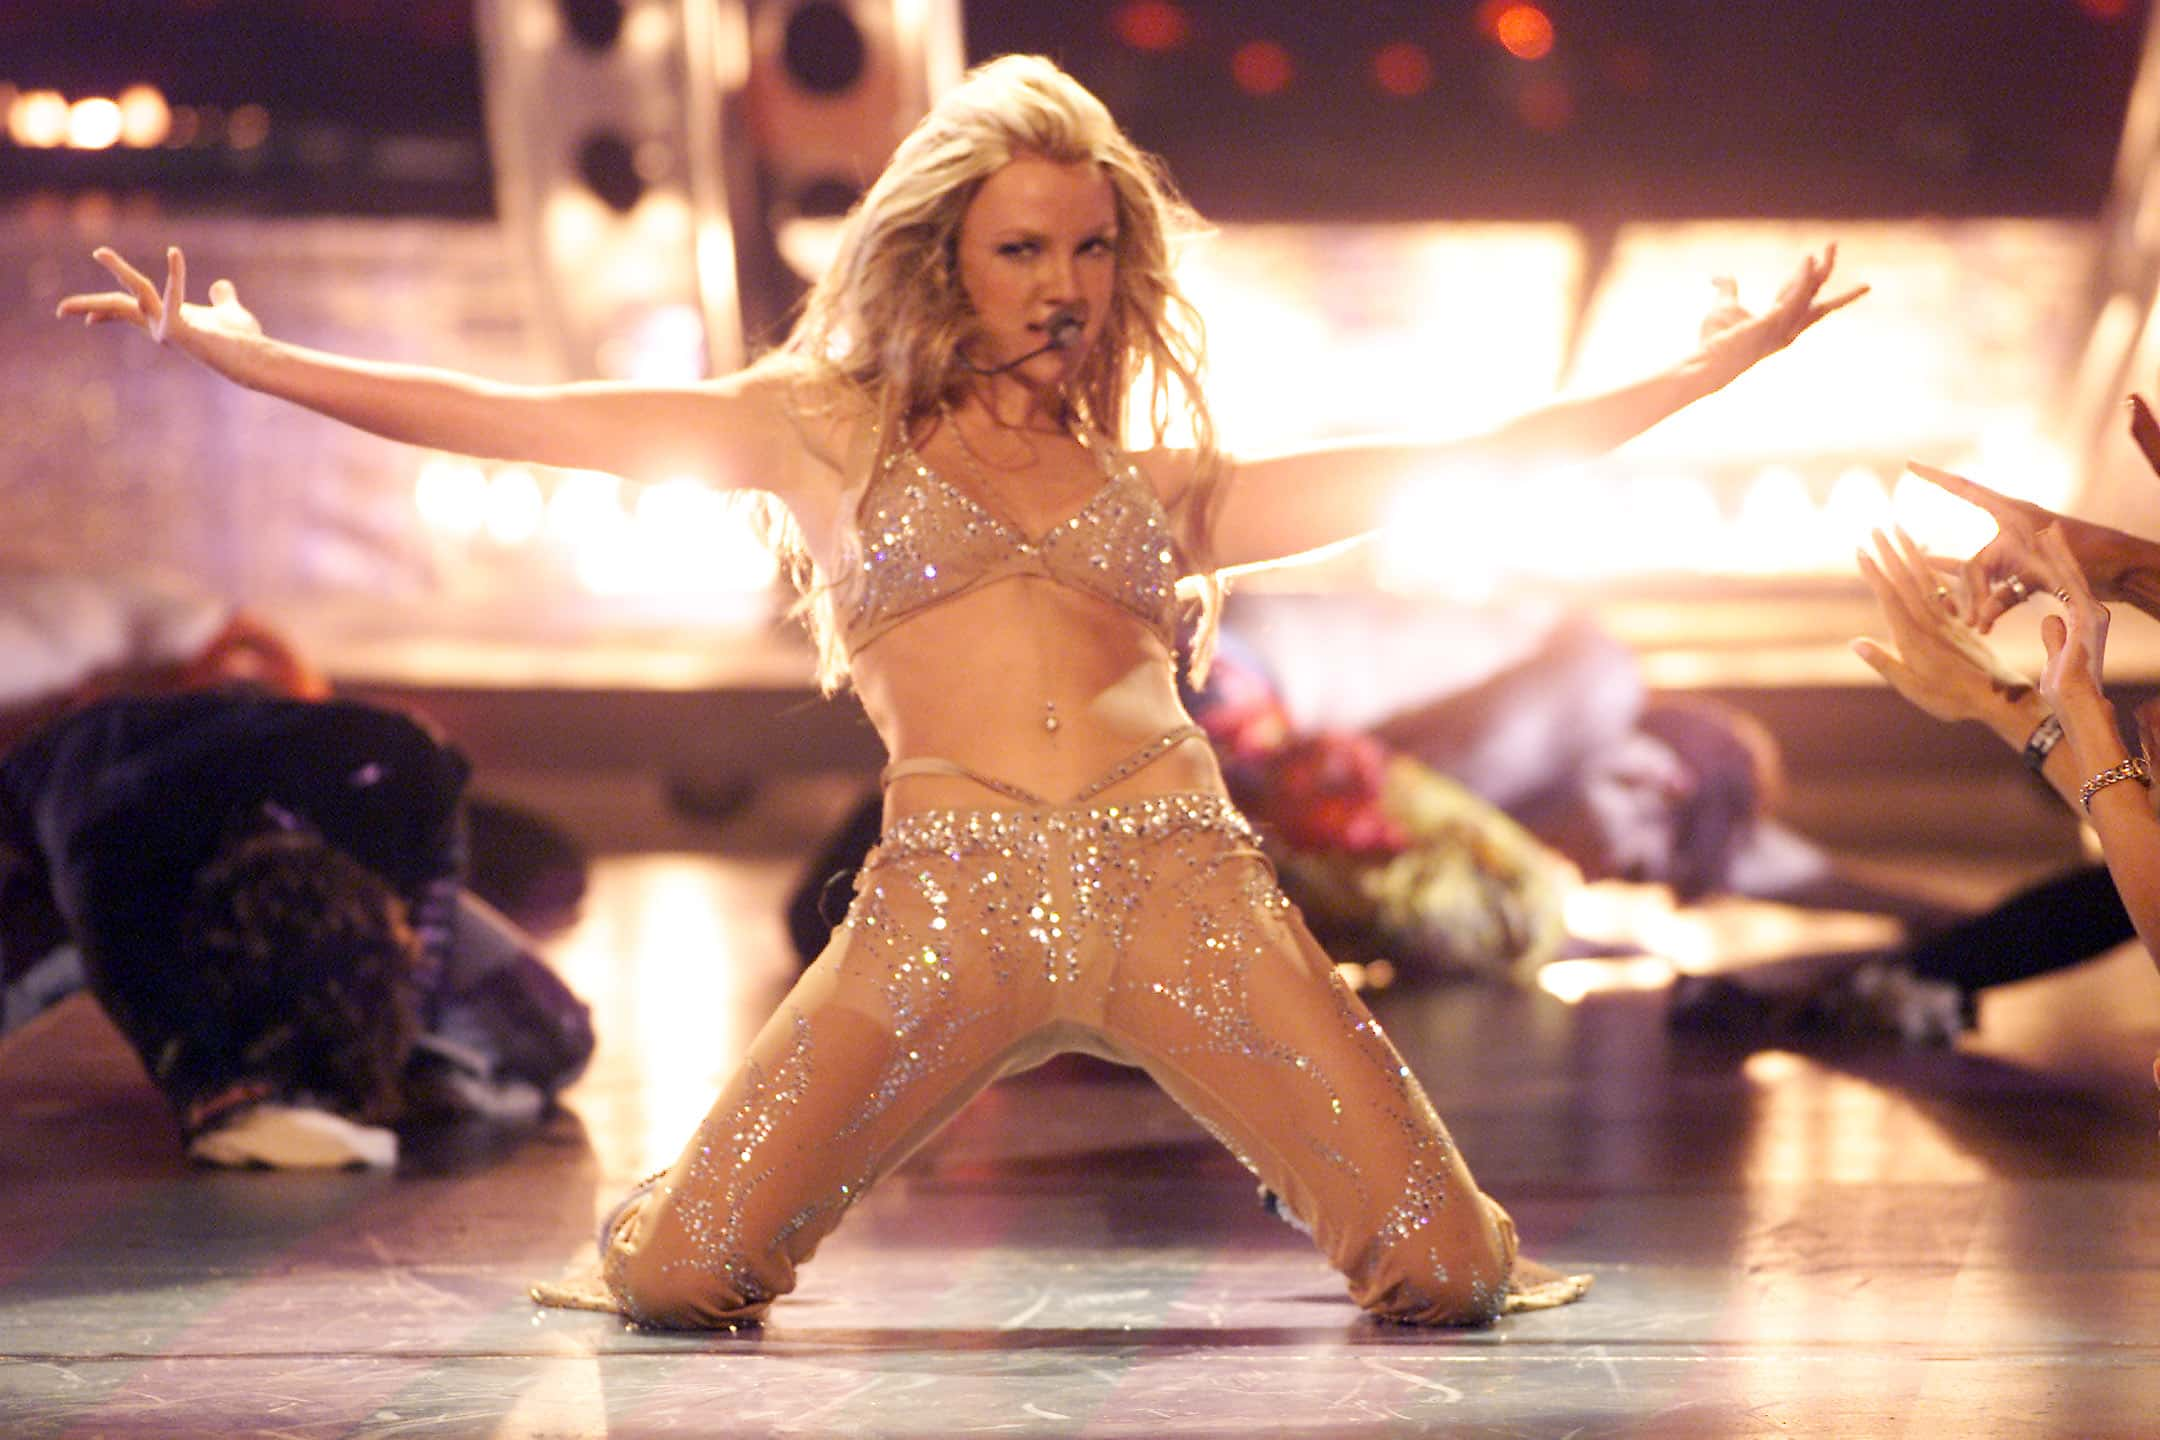 Britney spears nude sextape pics uncensored free xxx galeries